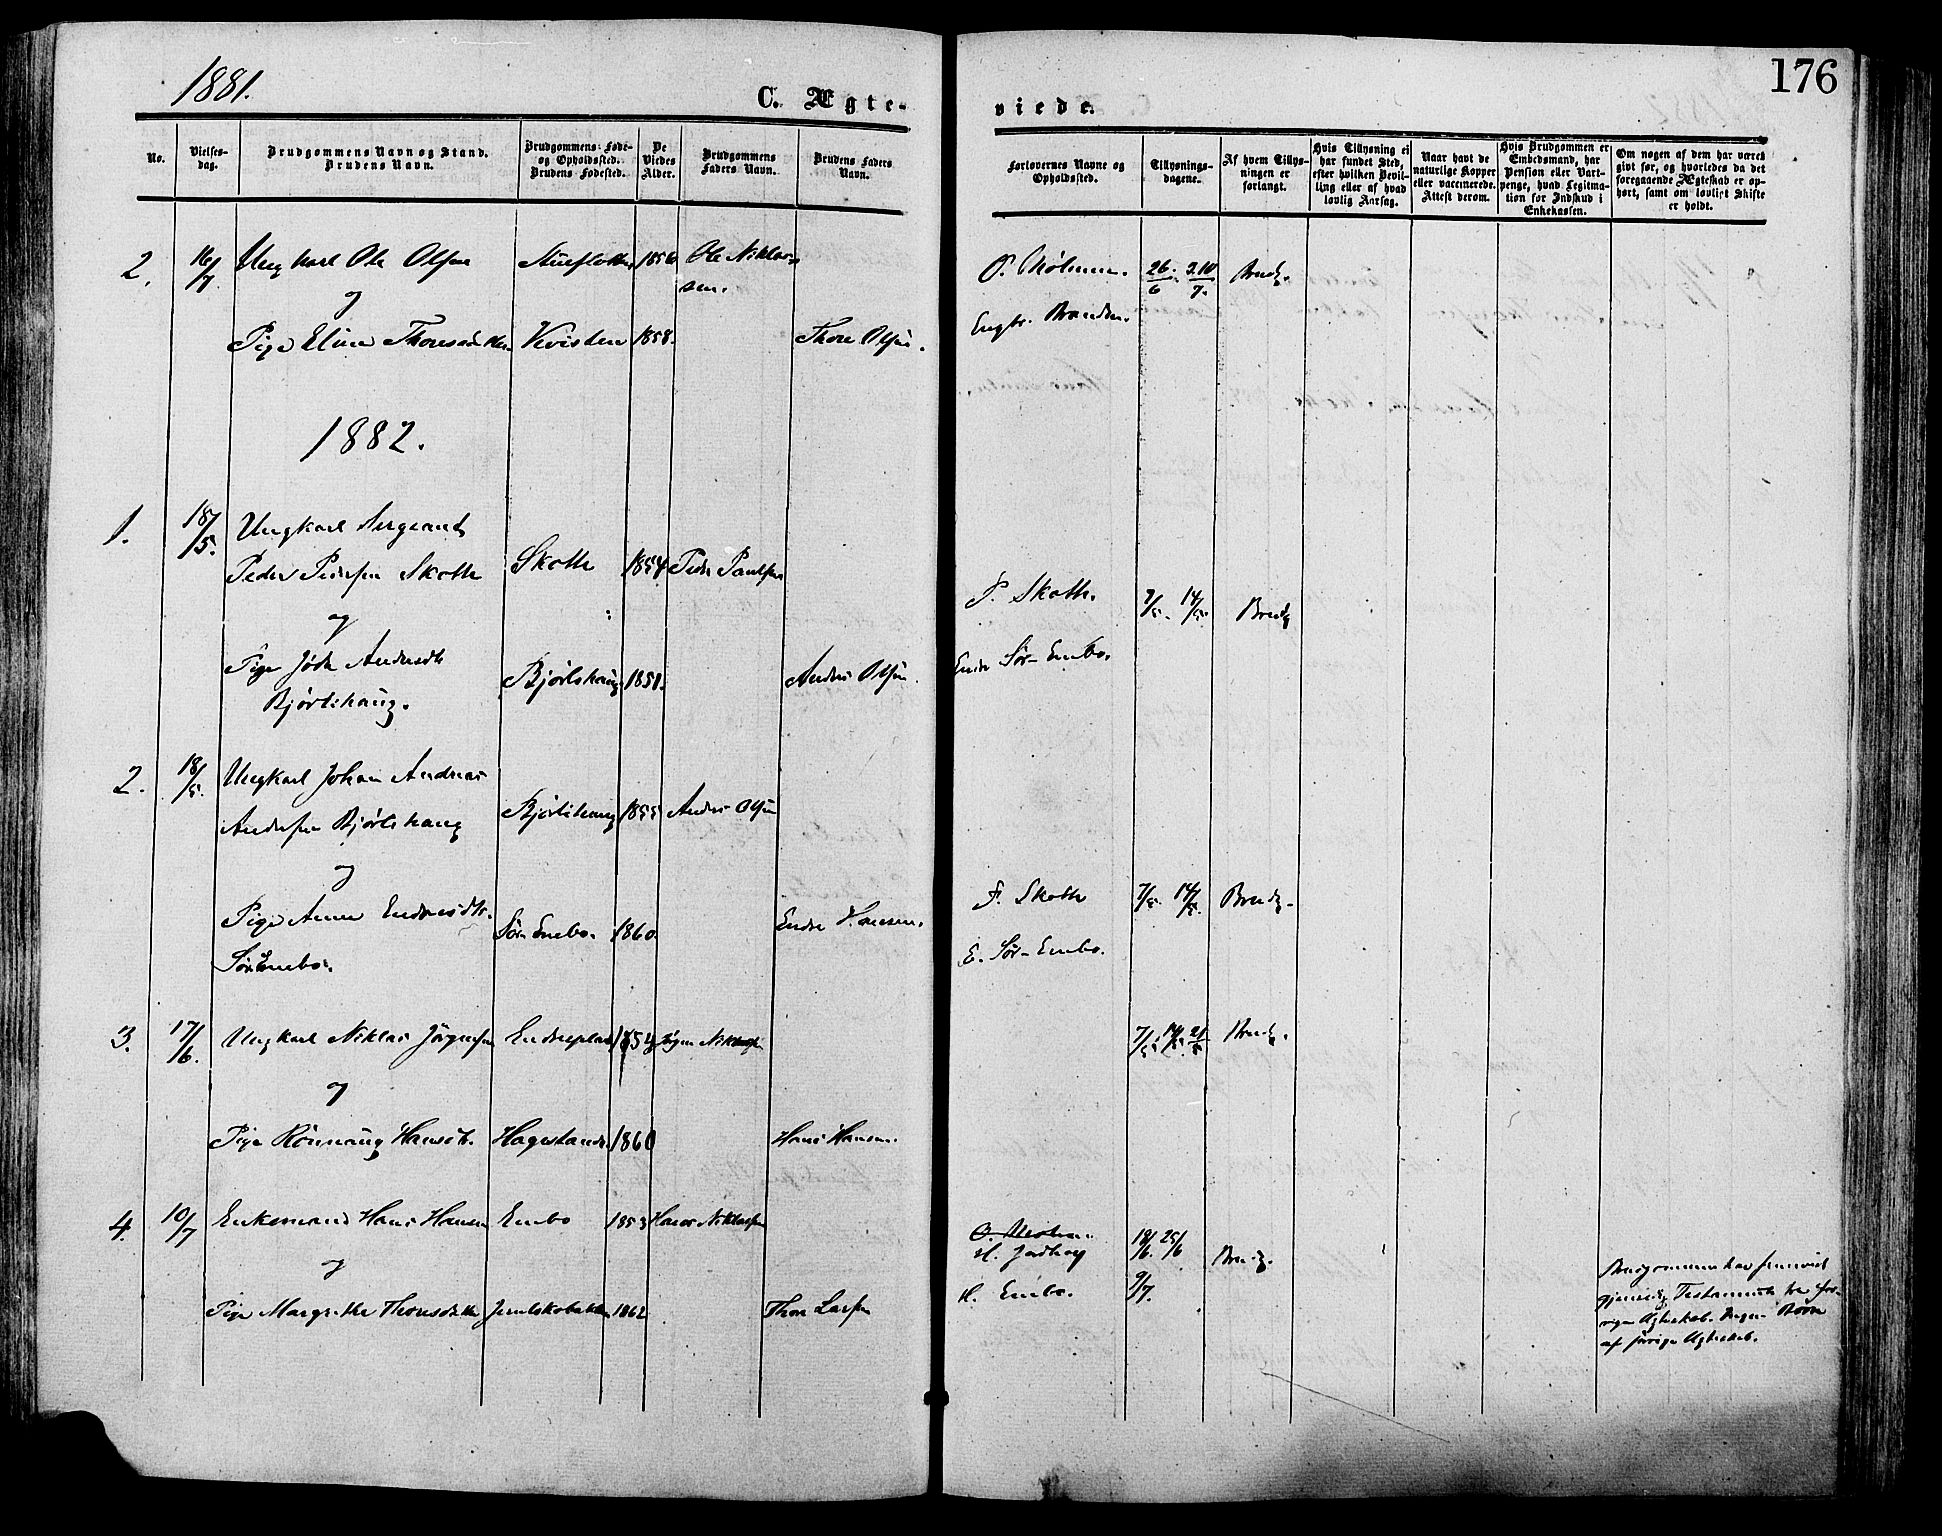 SAH, Lesja prestekontor, Ministerialbok nr. 9, 1854-1889, s. 176